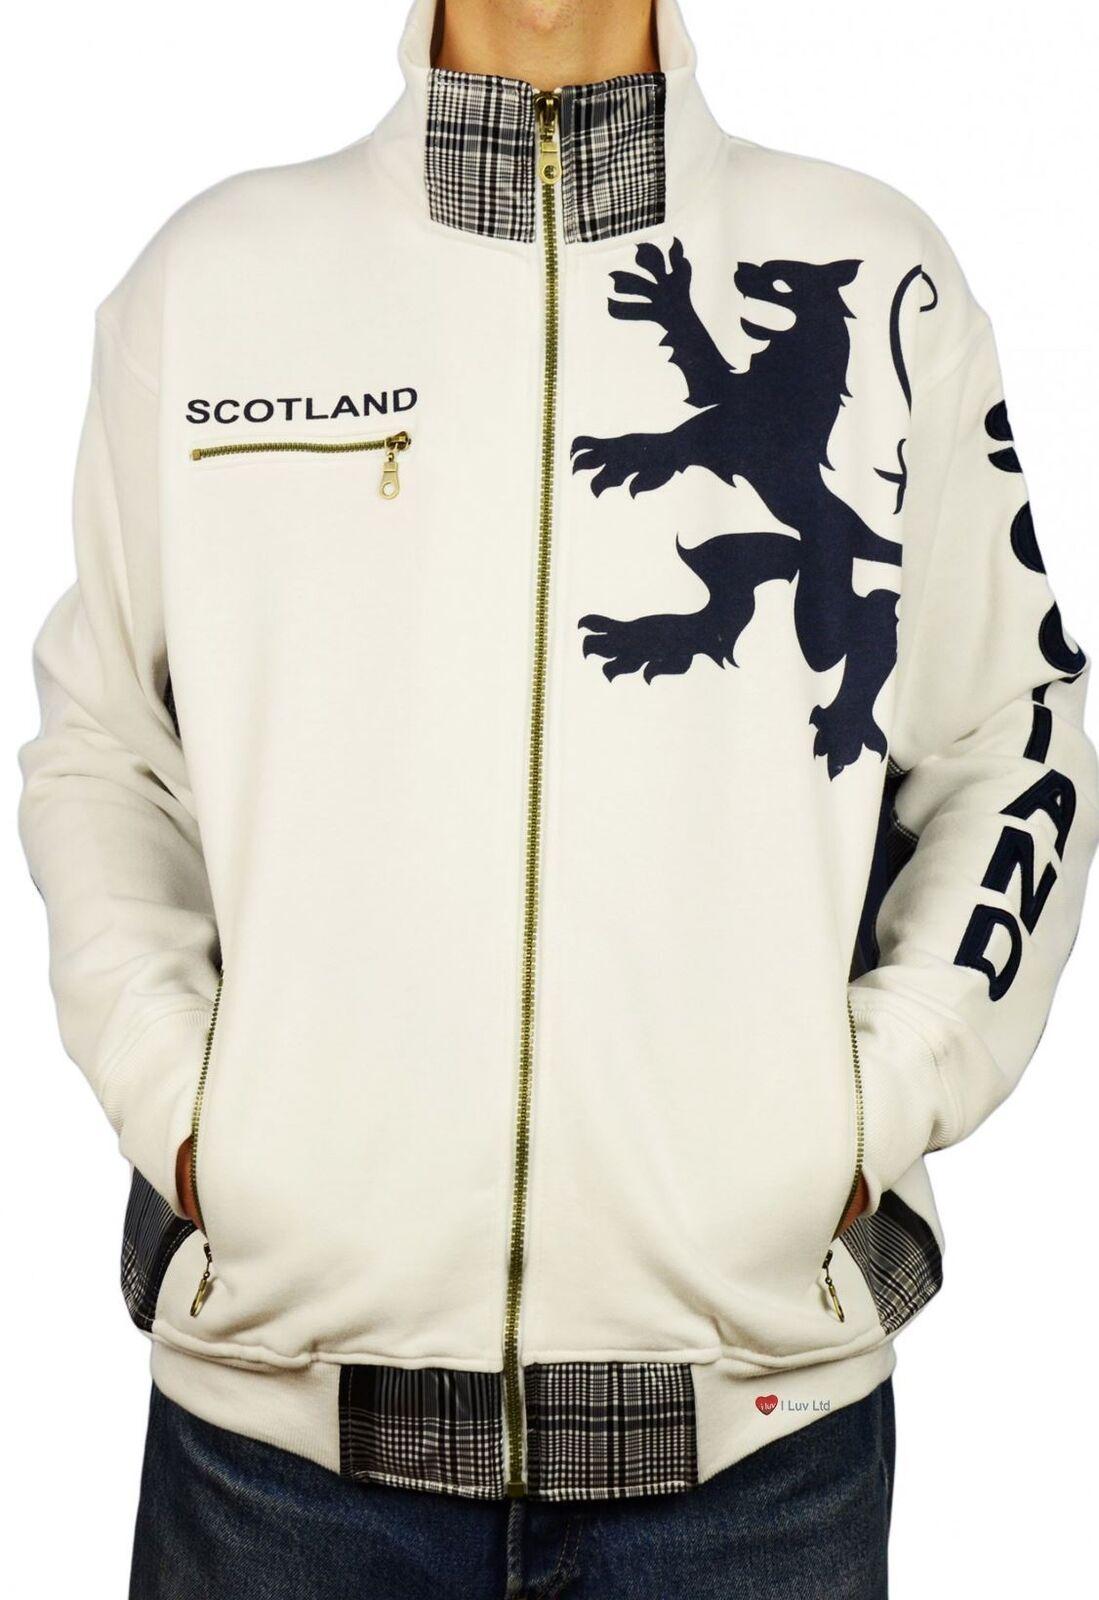 Mens Zipper Top Scotland Lion Tartan Insert White Size X-Large